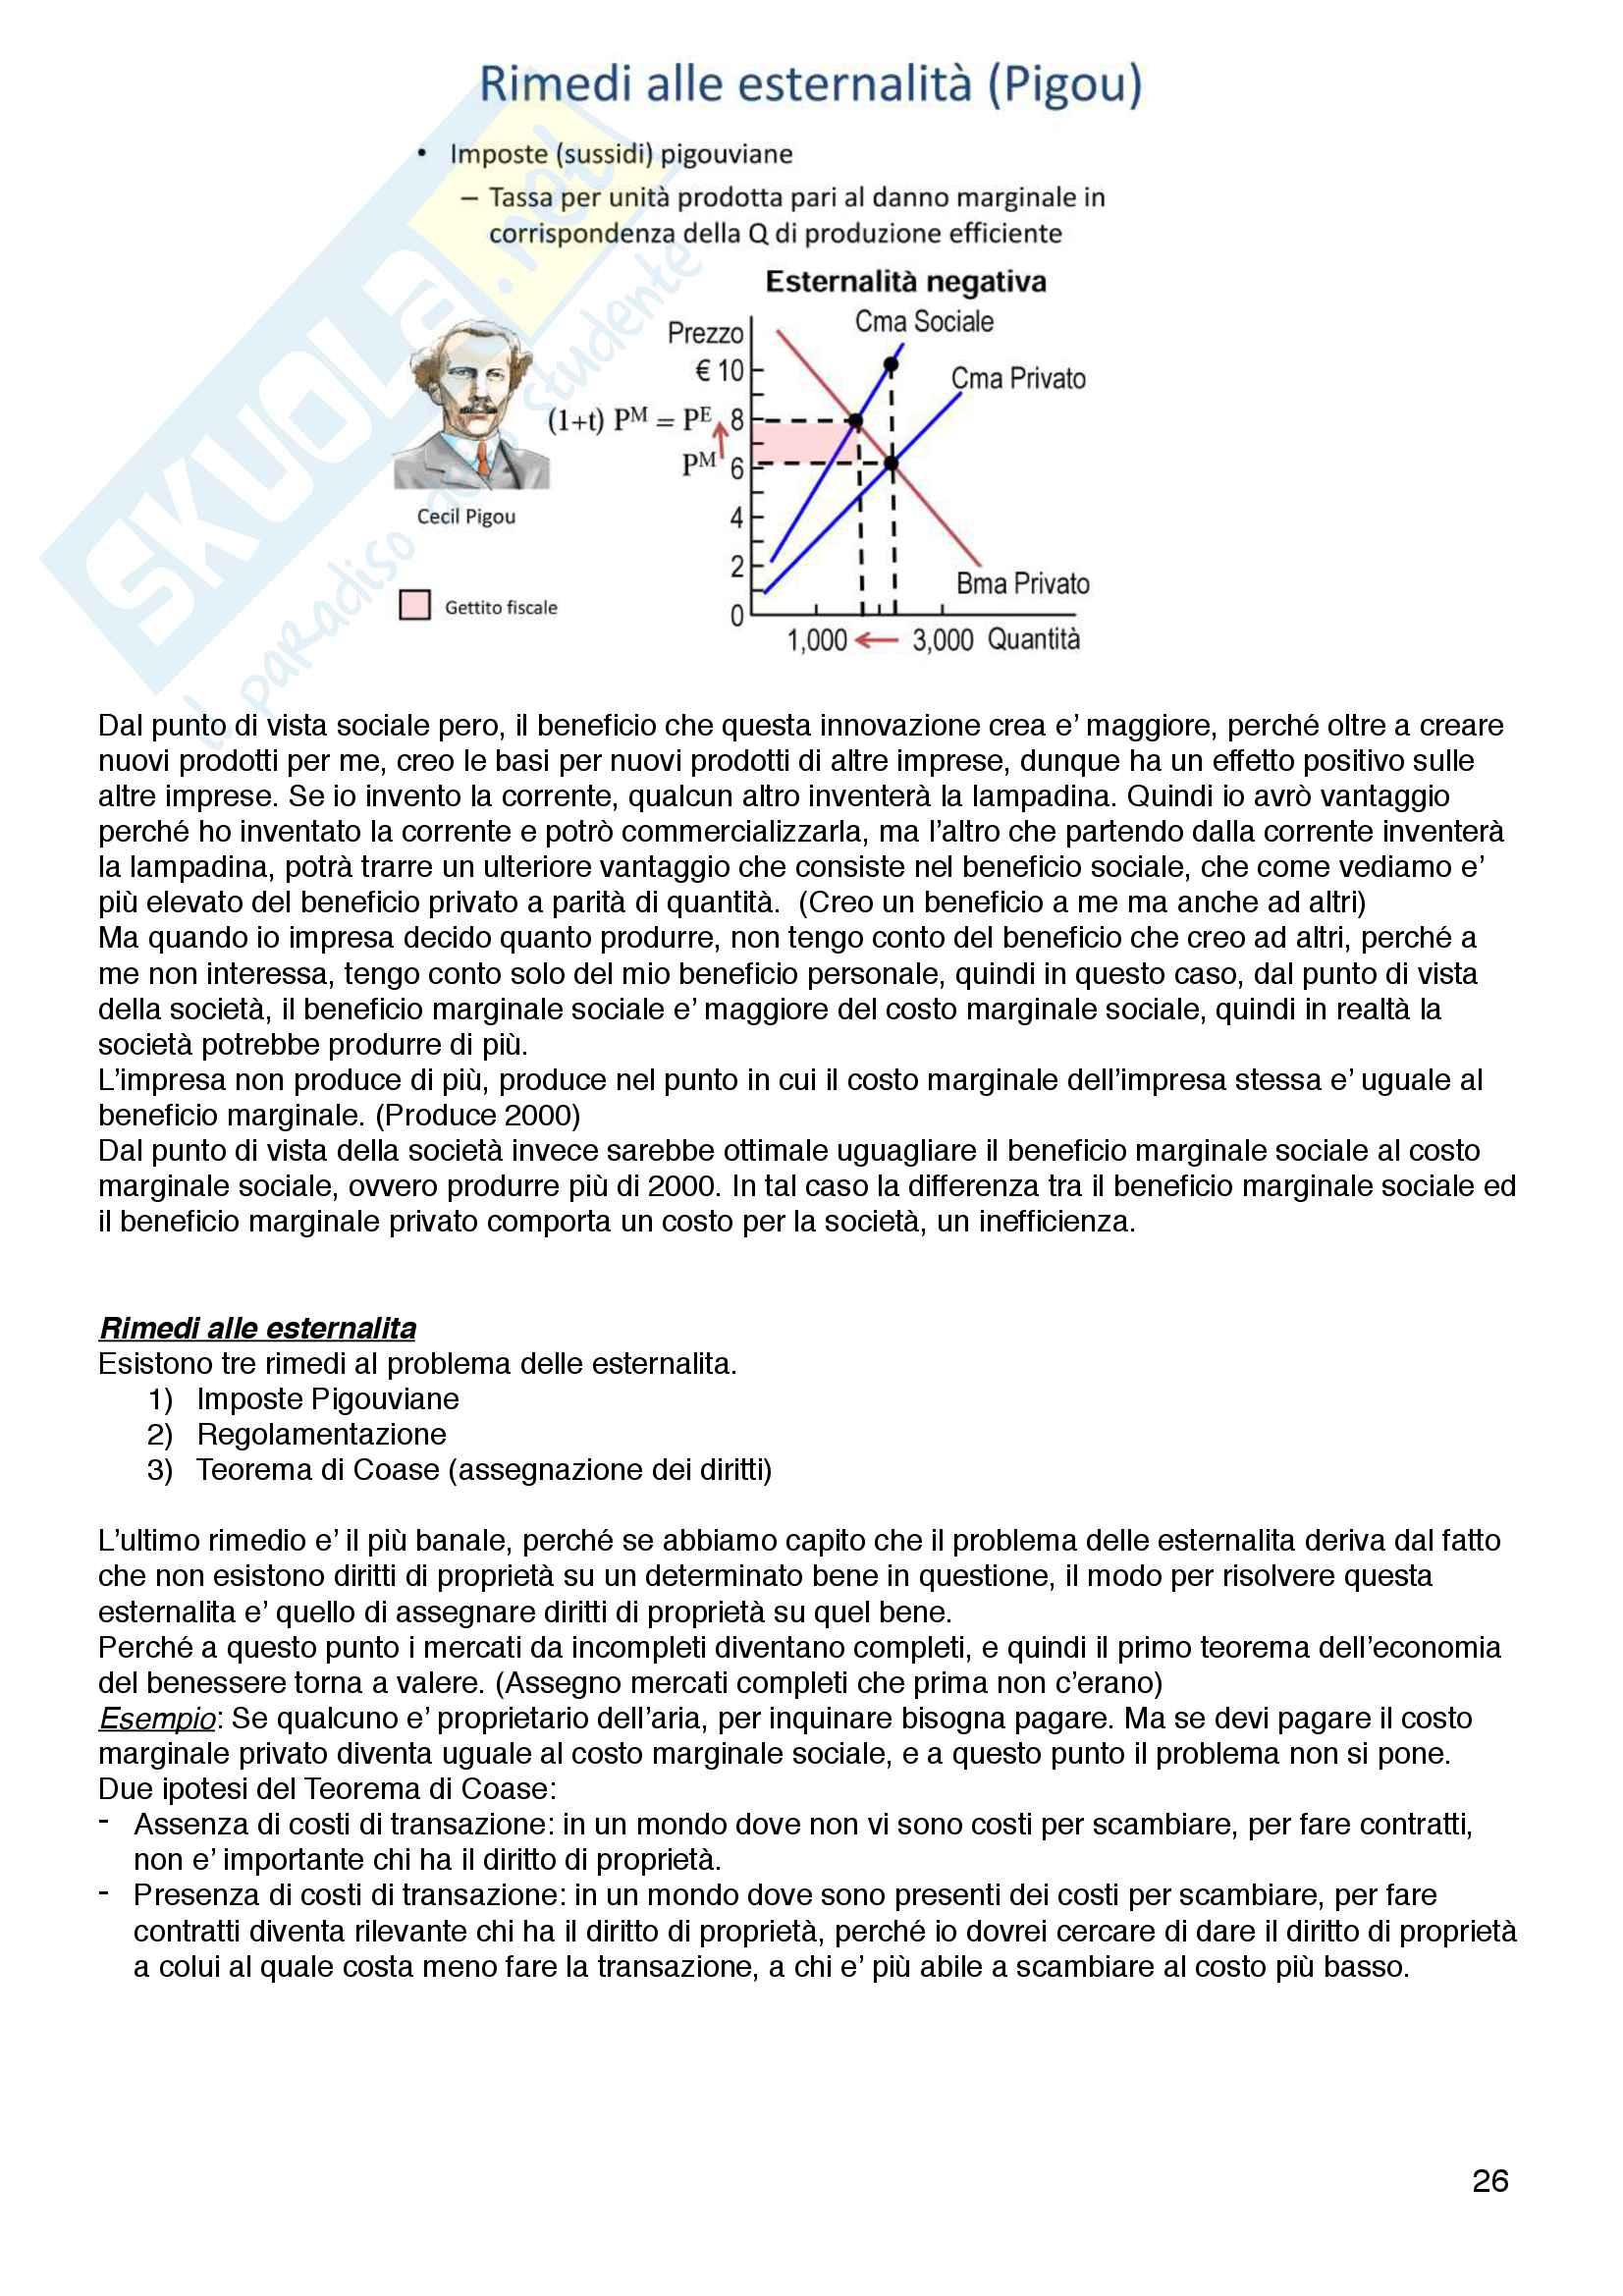 Riassunto esame Politica Economica - Di Bartolomeo - Franzini Pag. 26